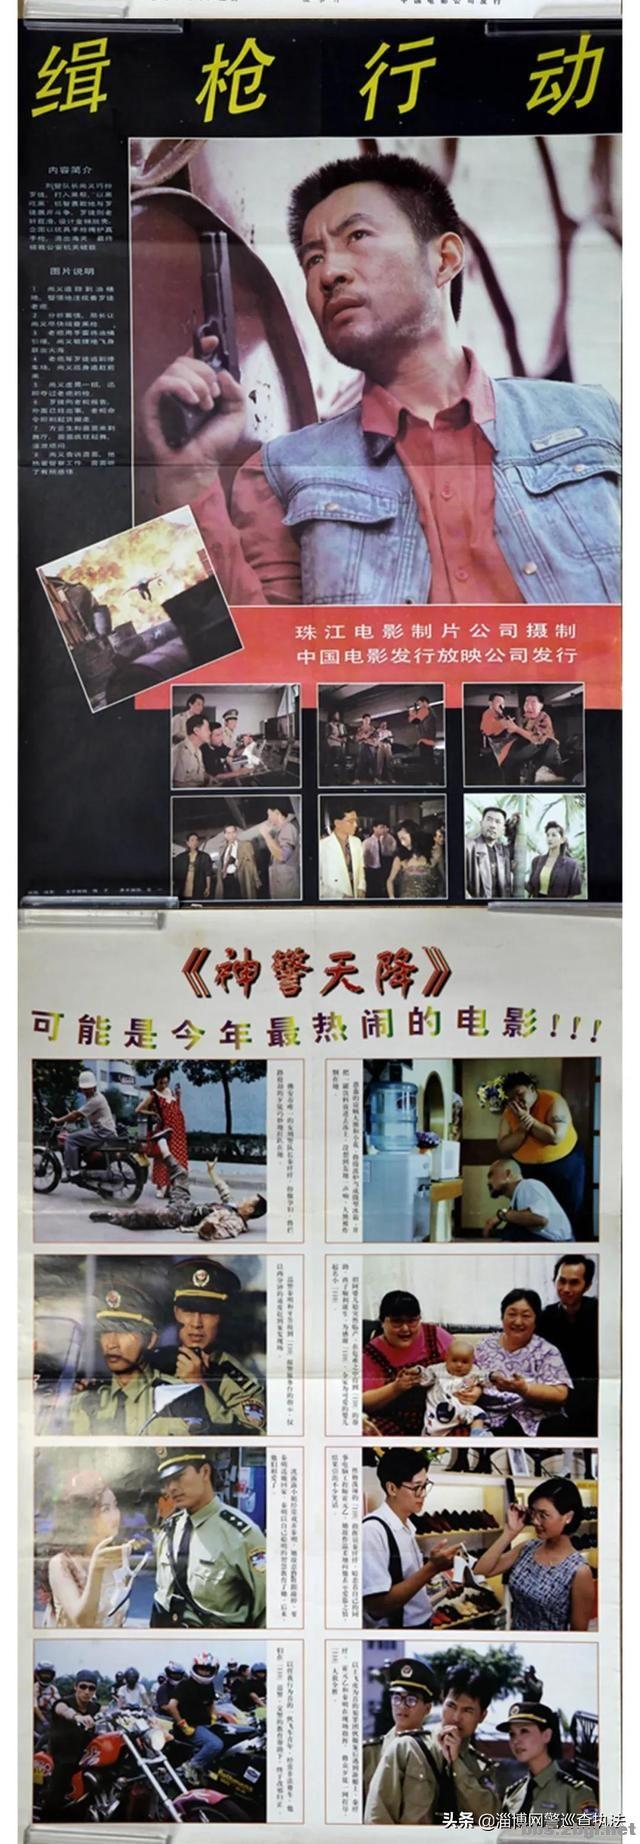 YYDS!这些电影里的警察陪伴了多少人的青春......-17.jpg